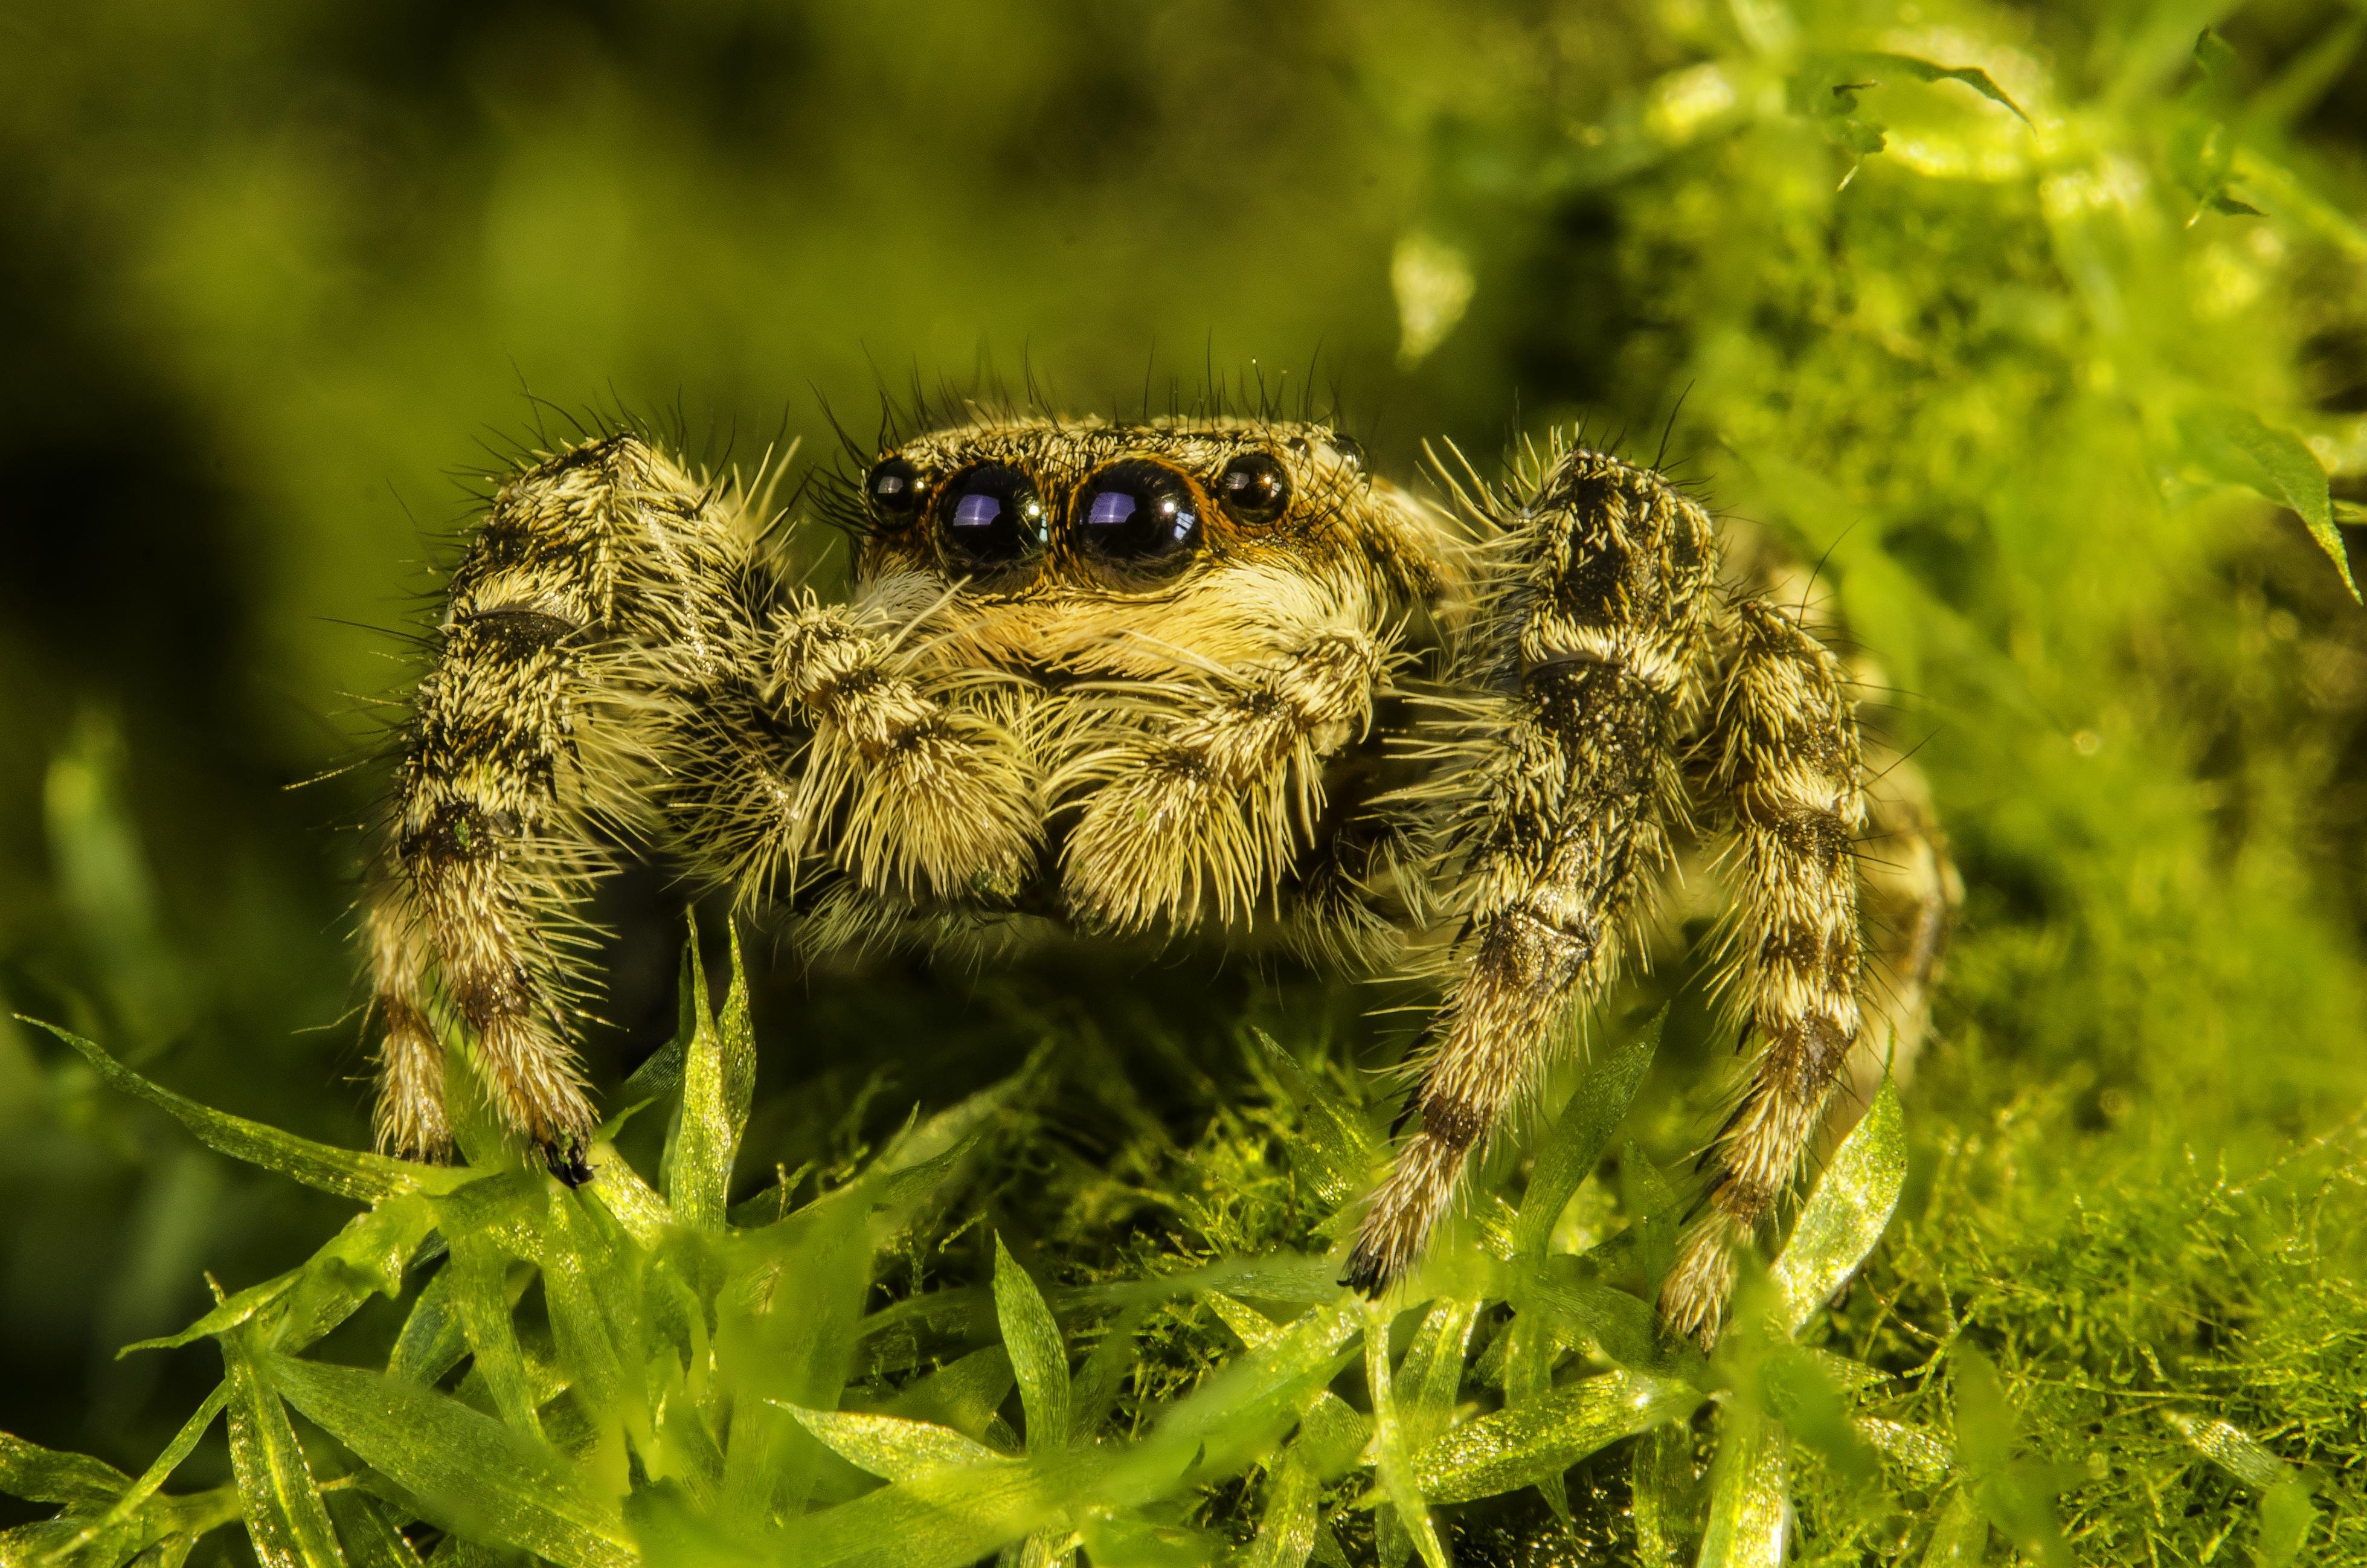 Cute Spider Wallpaper Free Stock Photo Of Arachnid Close Up Macro